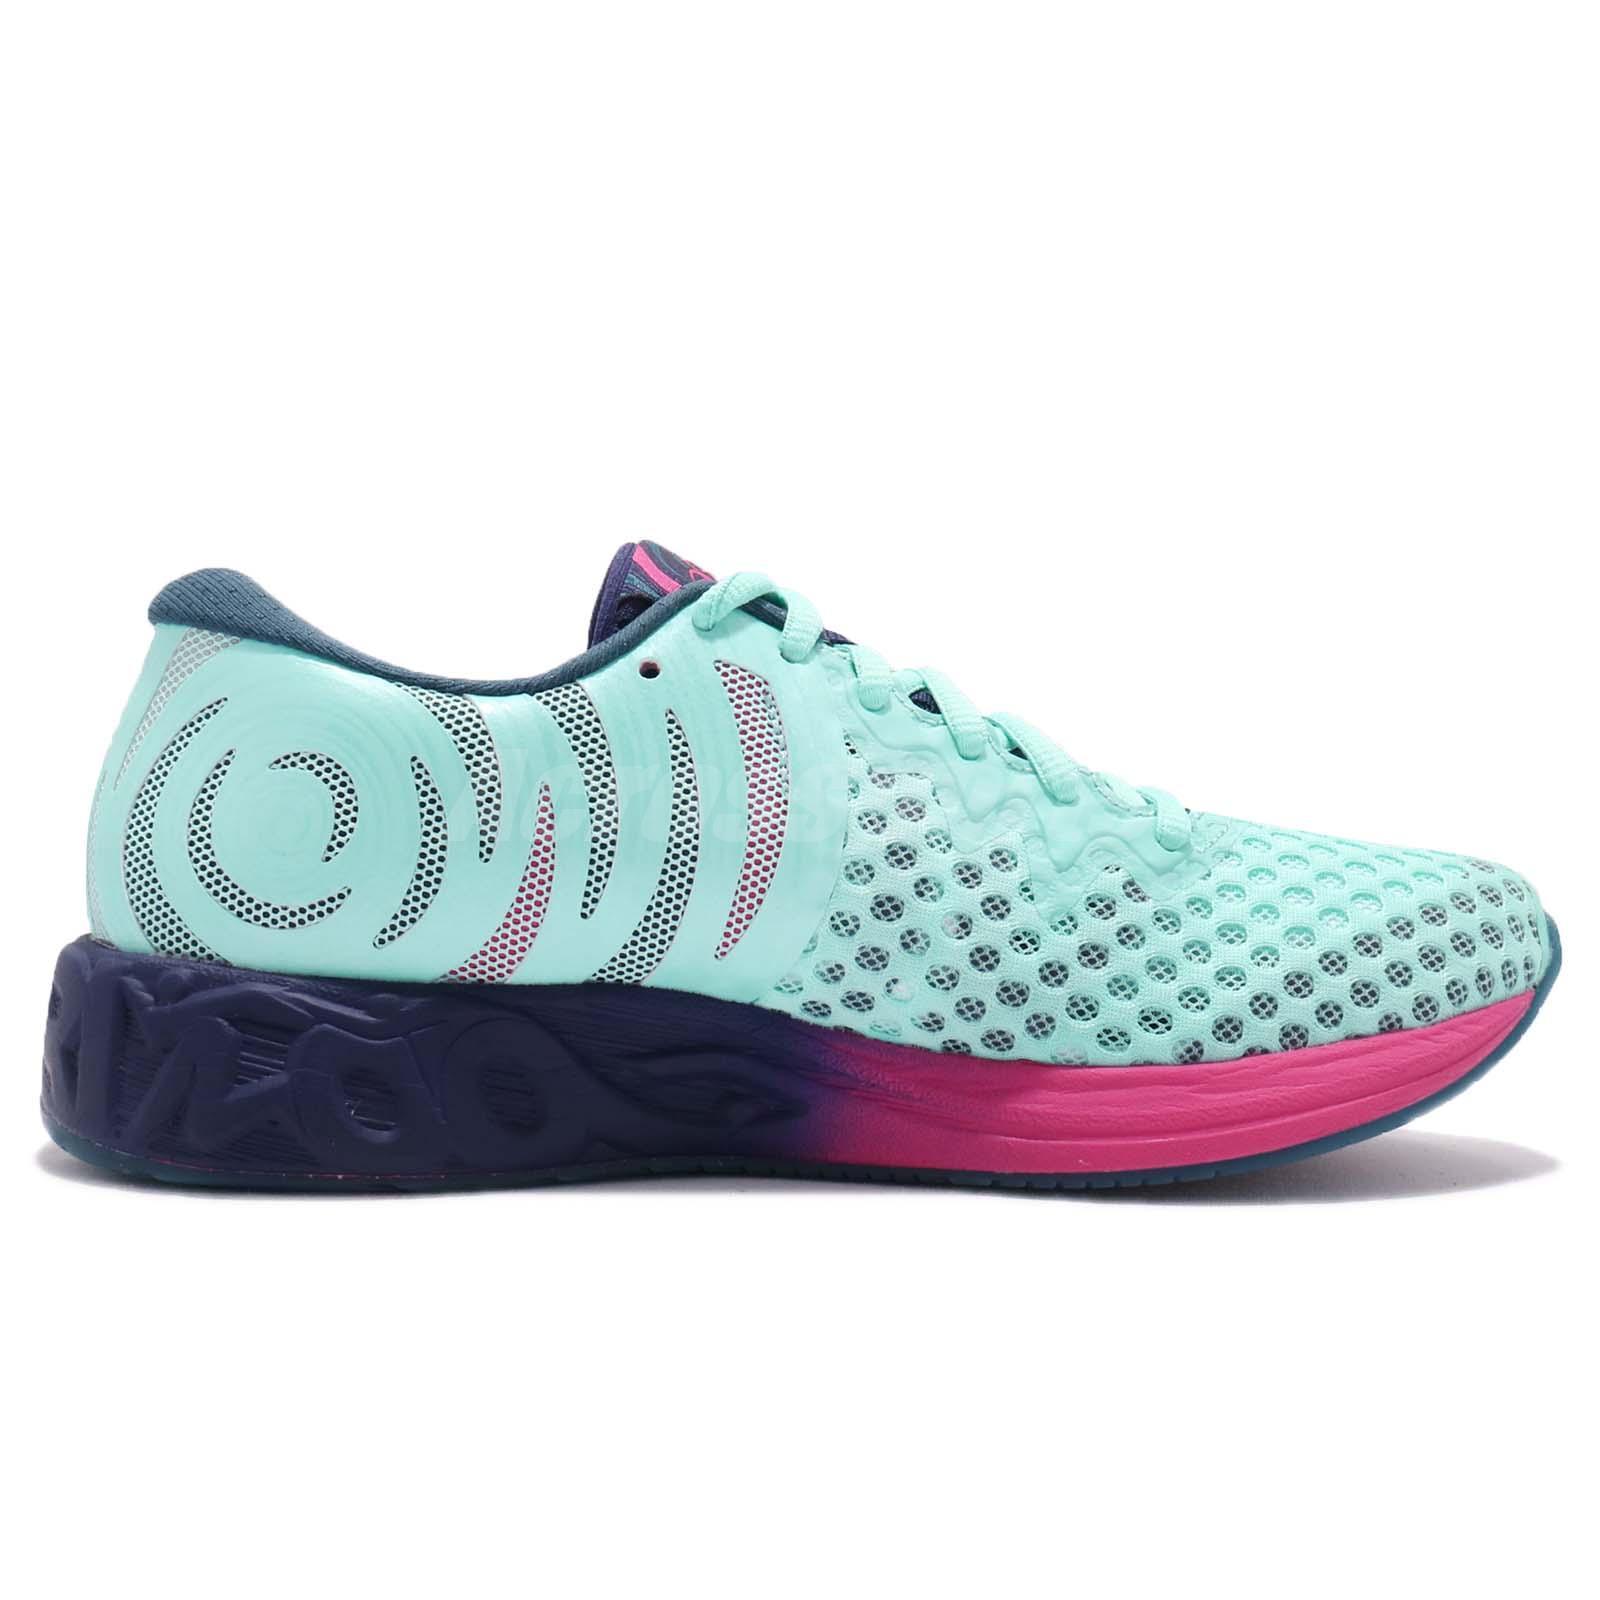 80e56789edb Asics Noosa FF 2 II Aruba Indigo Blue Purple Women Running Shoes ...